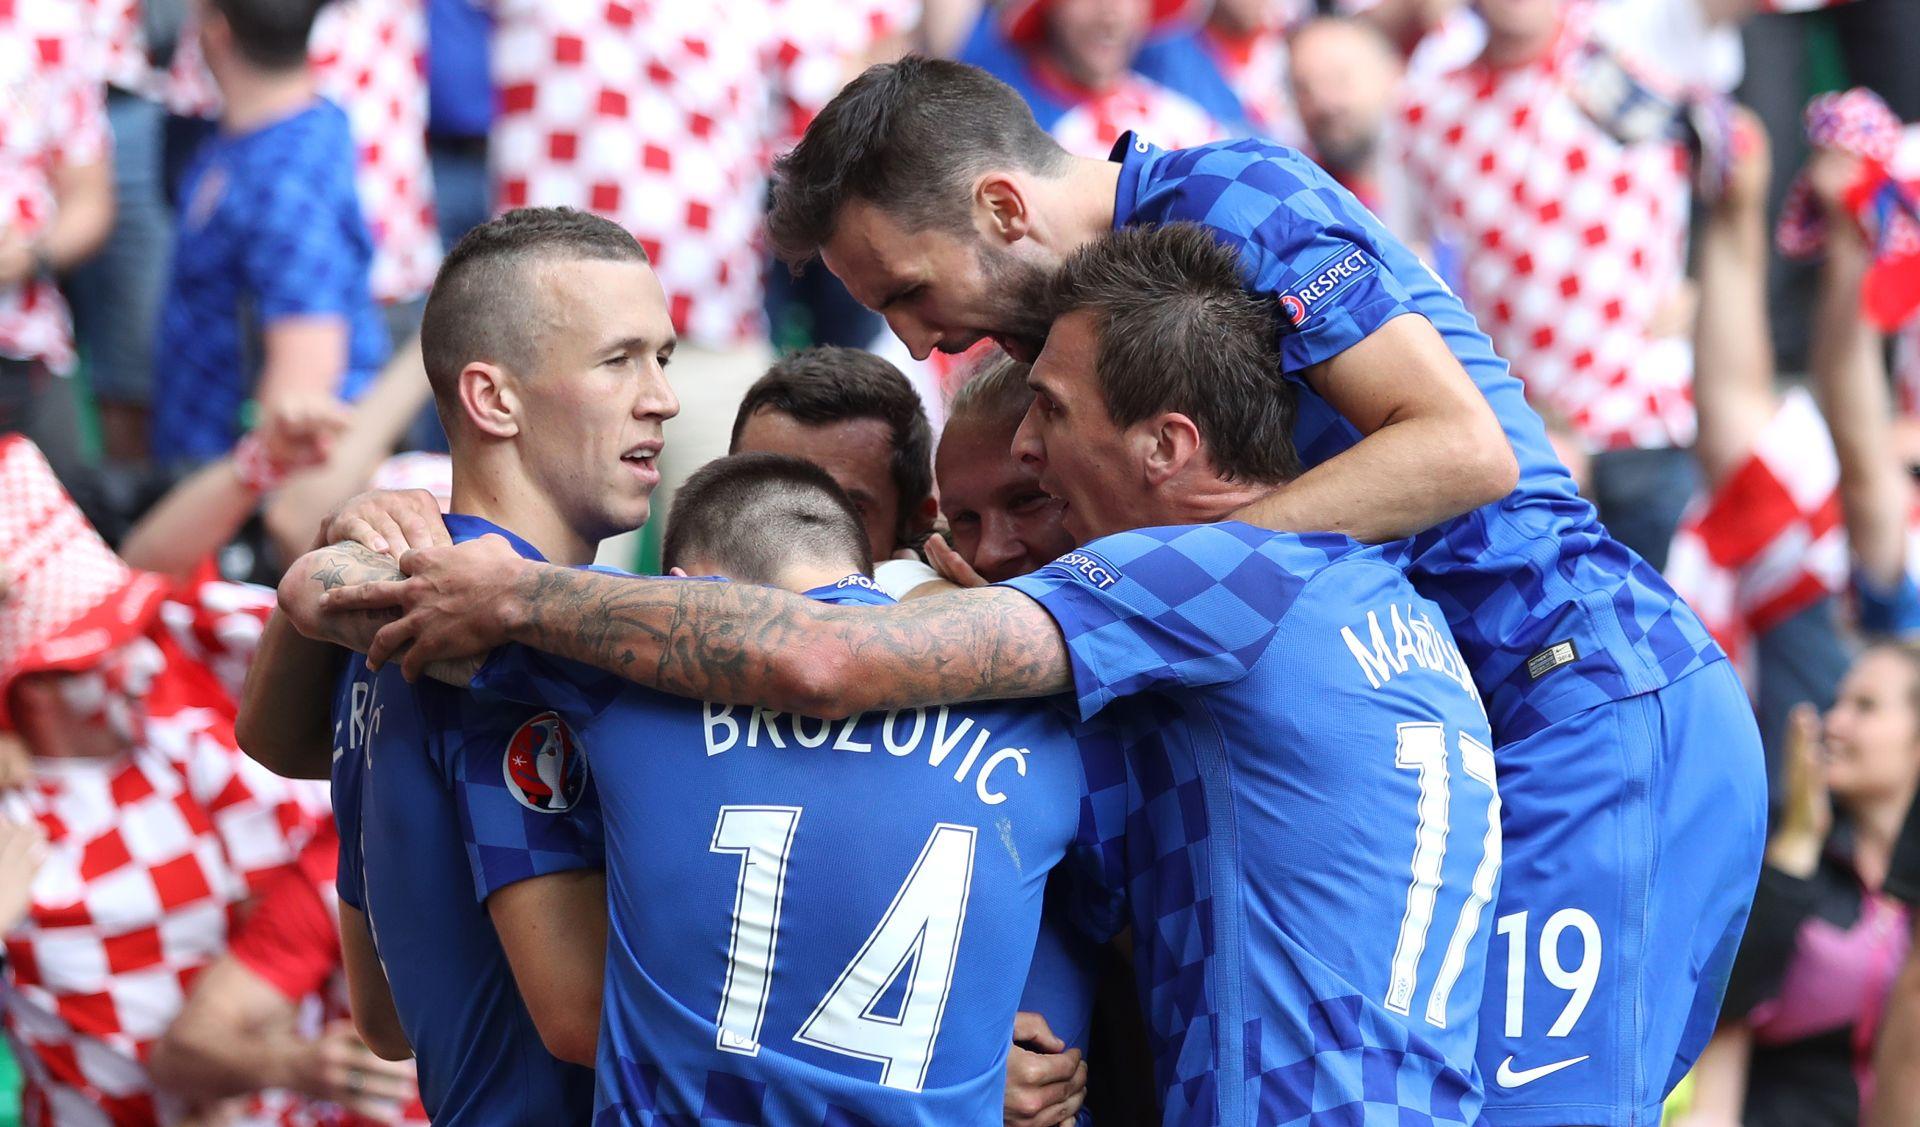 Kalkulacije uoči zadnjeg kola, Hrvatska korak do osmine finala